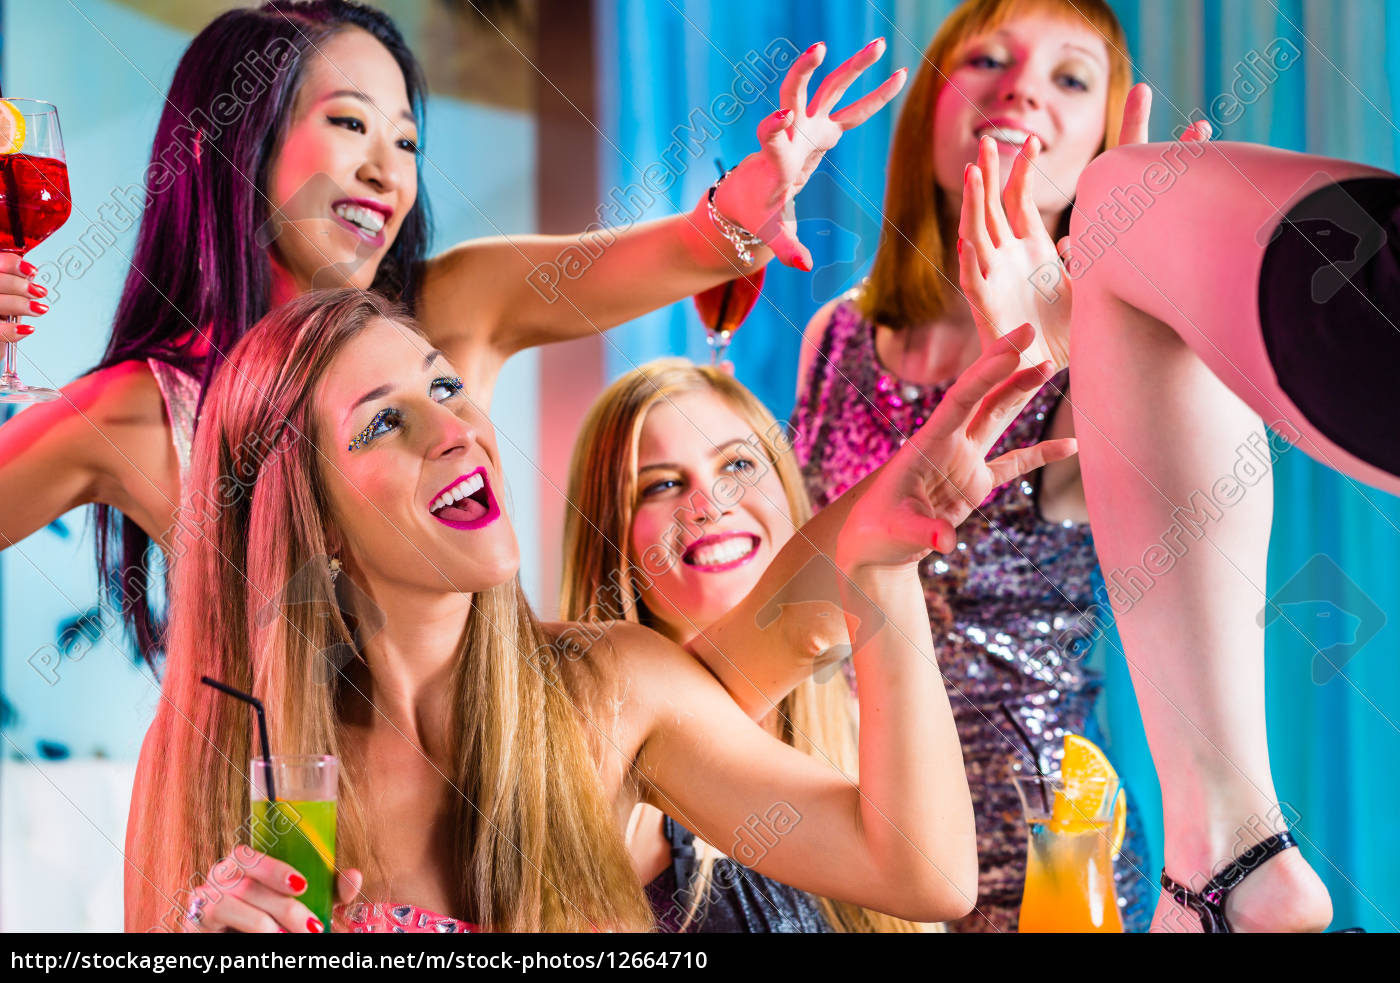 Stripclub für frauen